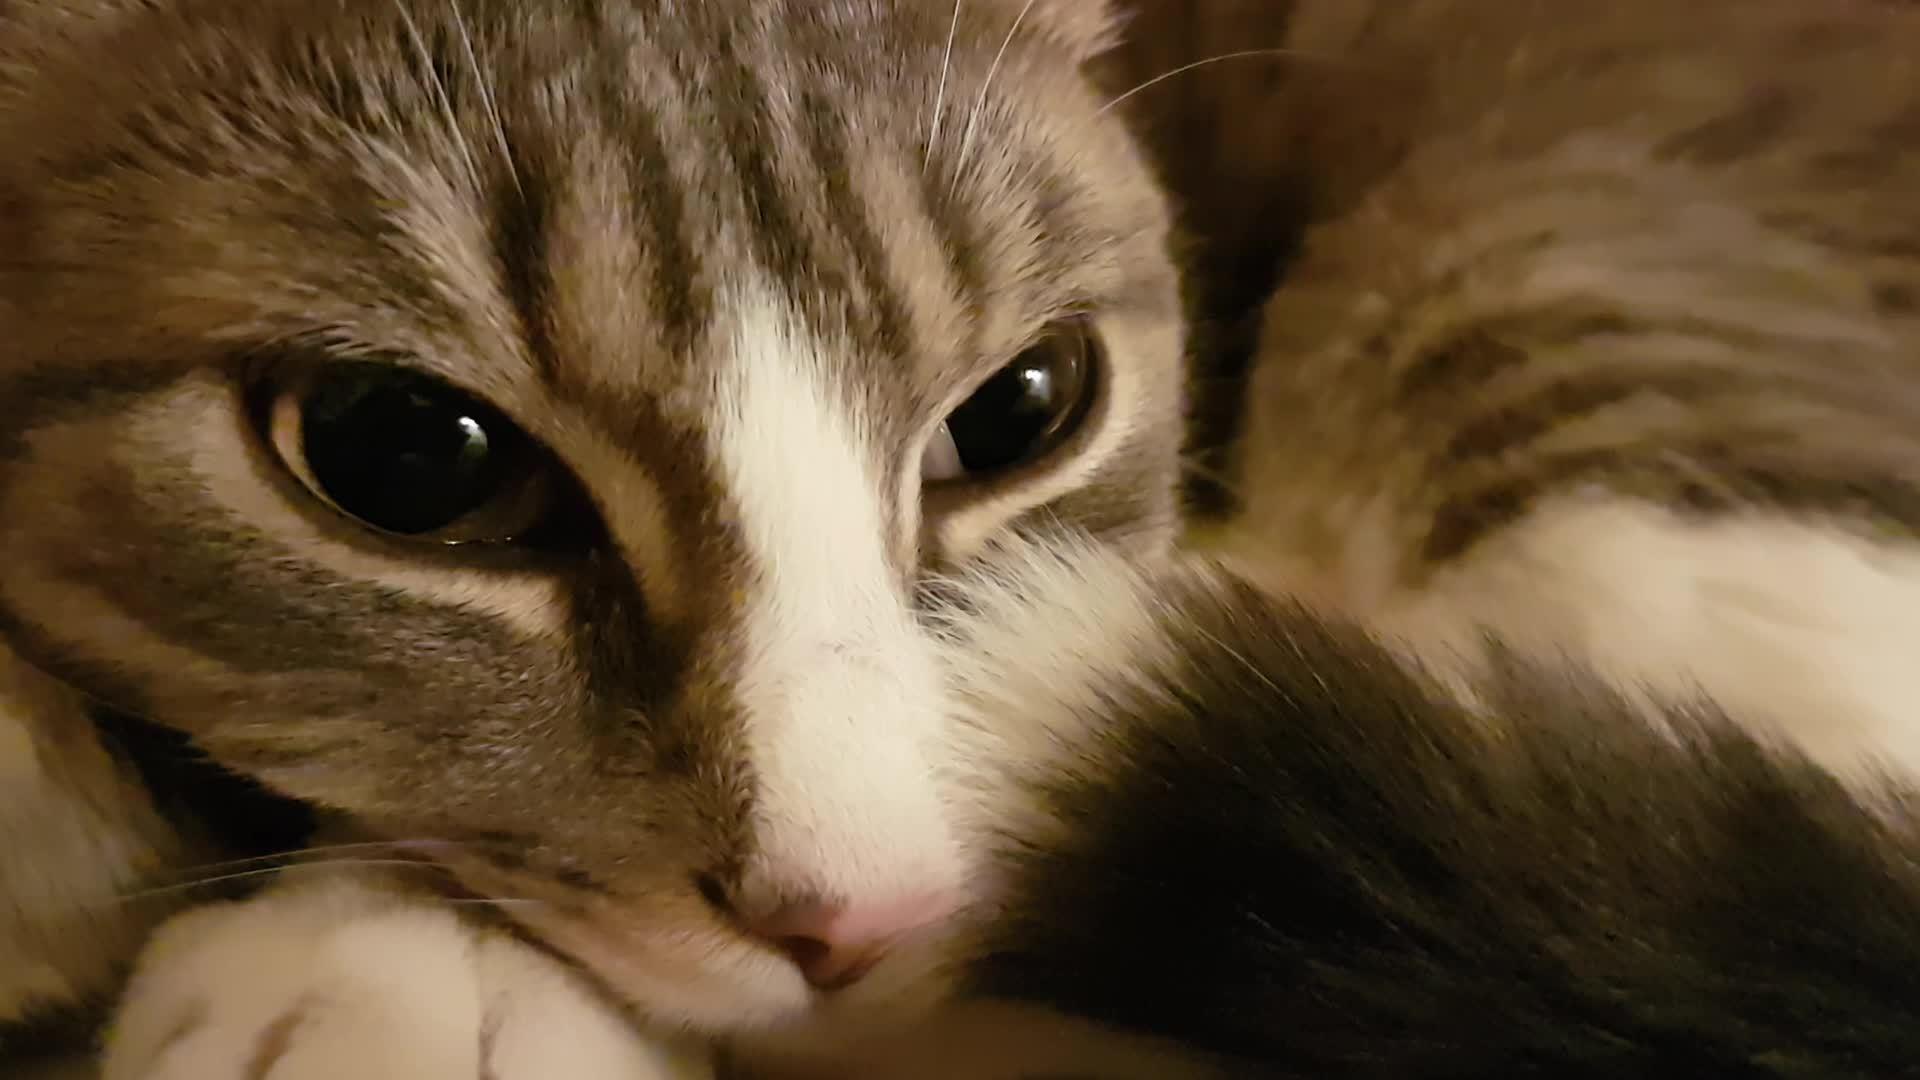 catgifs, Good morning! GIFs